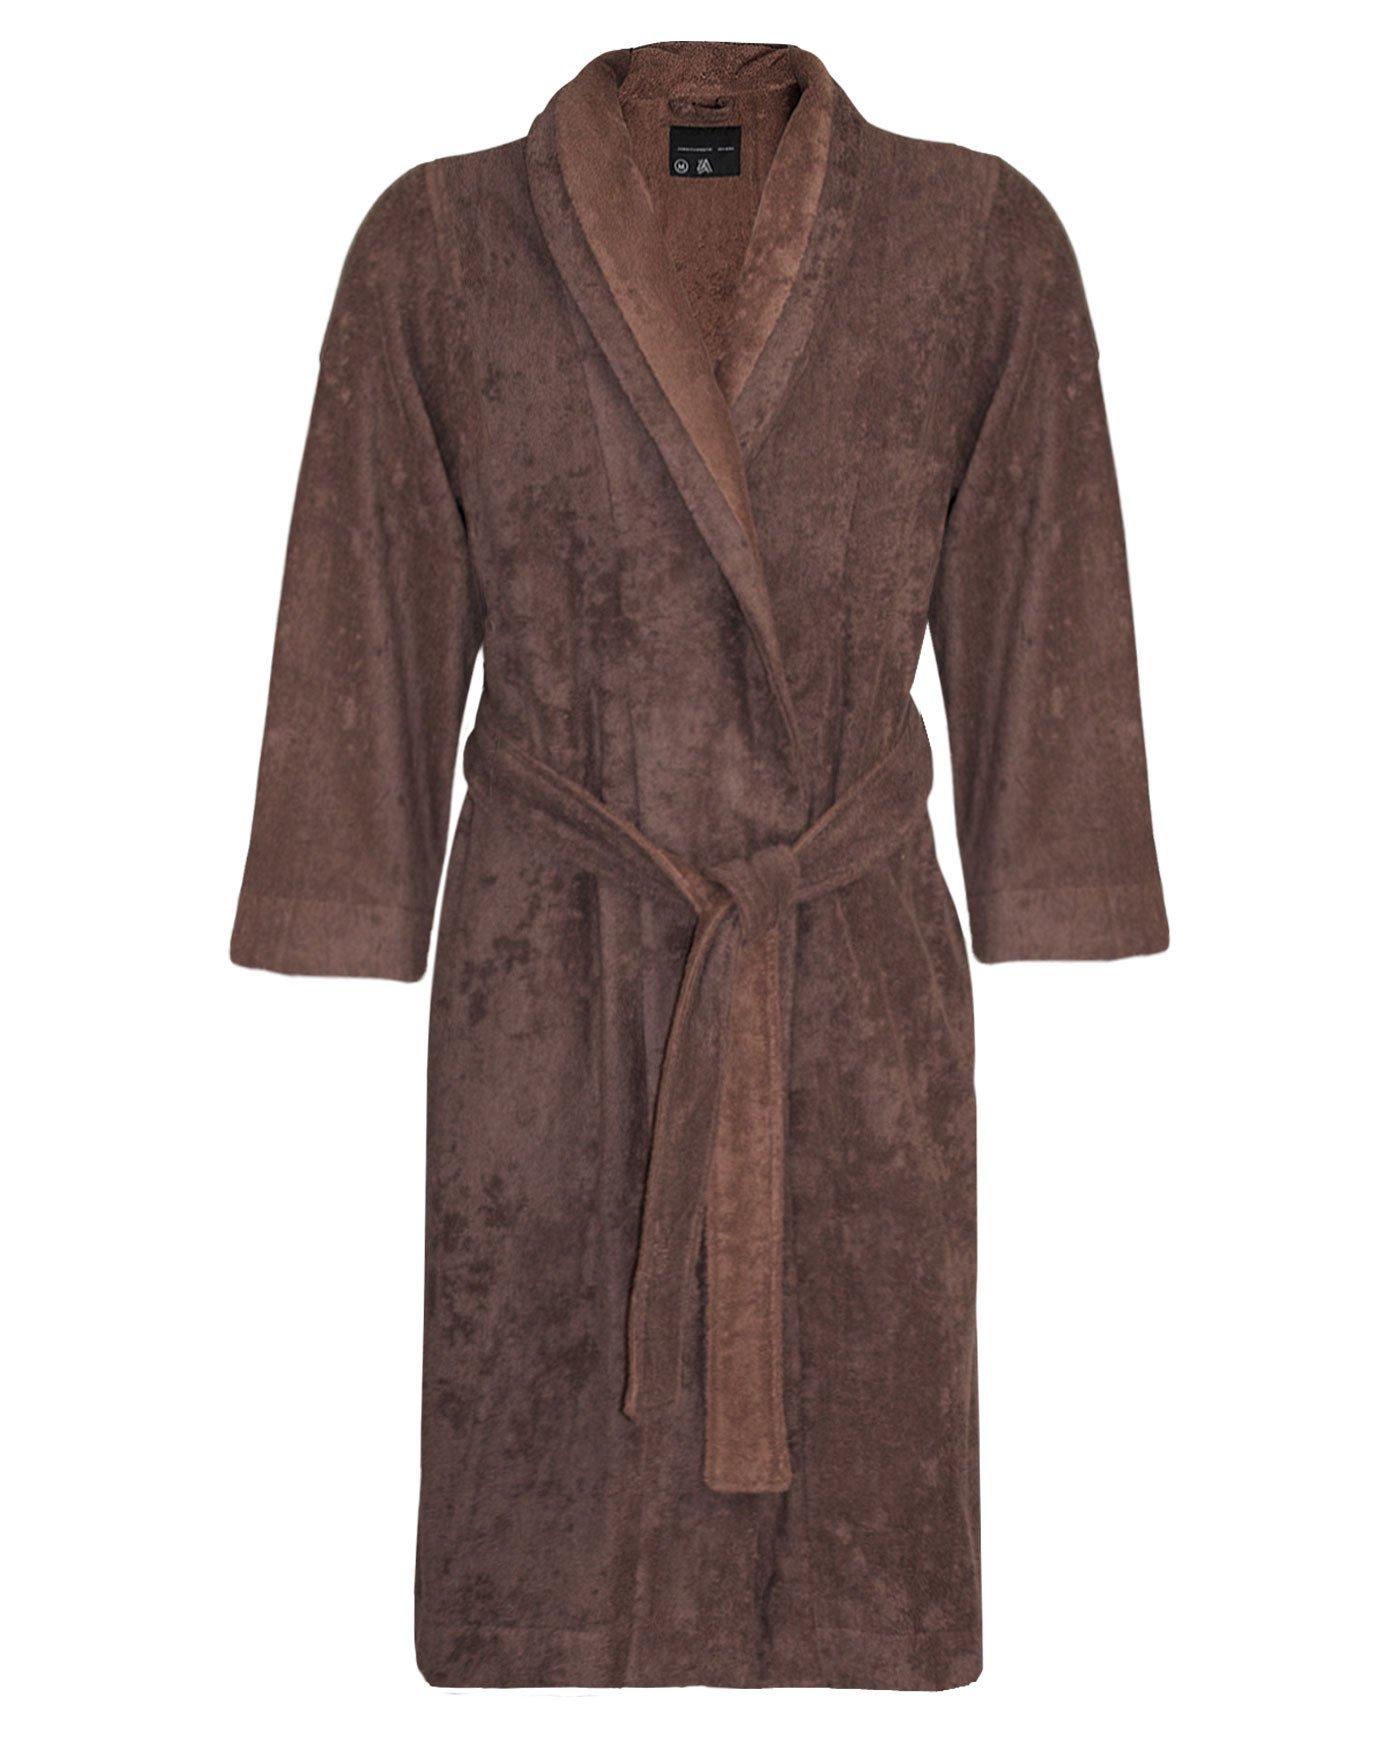 Armani International Bathrobe Slippers Cotton-Modal Medium Chocolate-Golden Brown